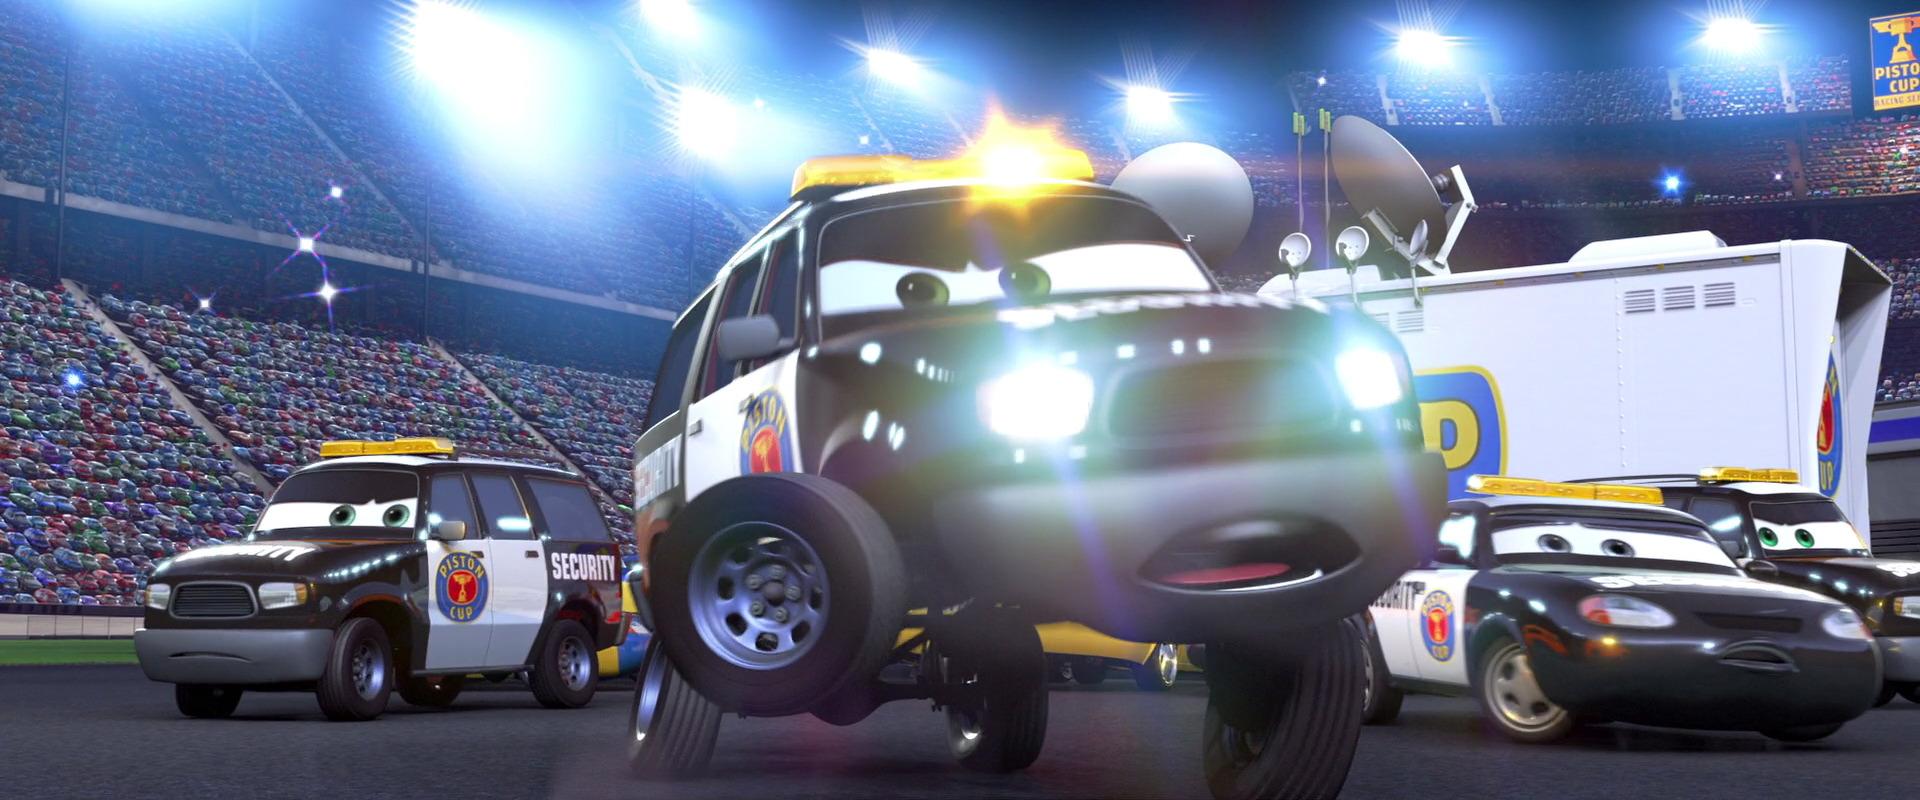 richard clayton kensington personnage character pixar disney cars